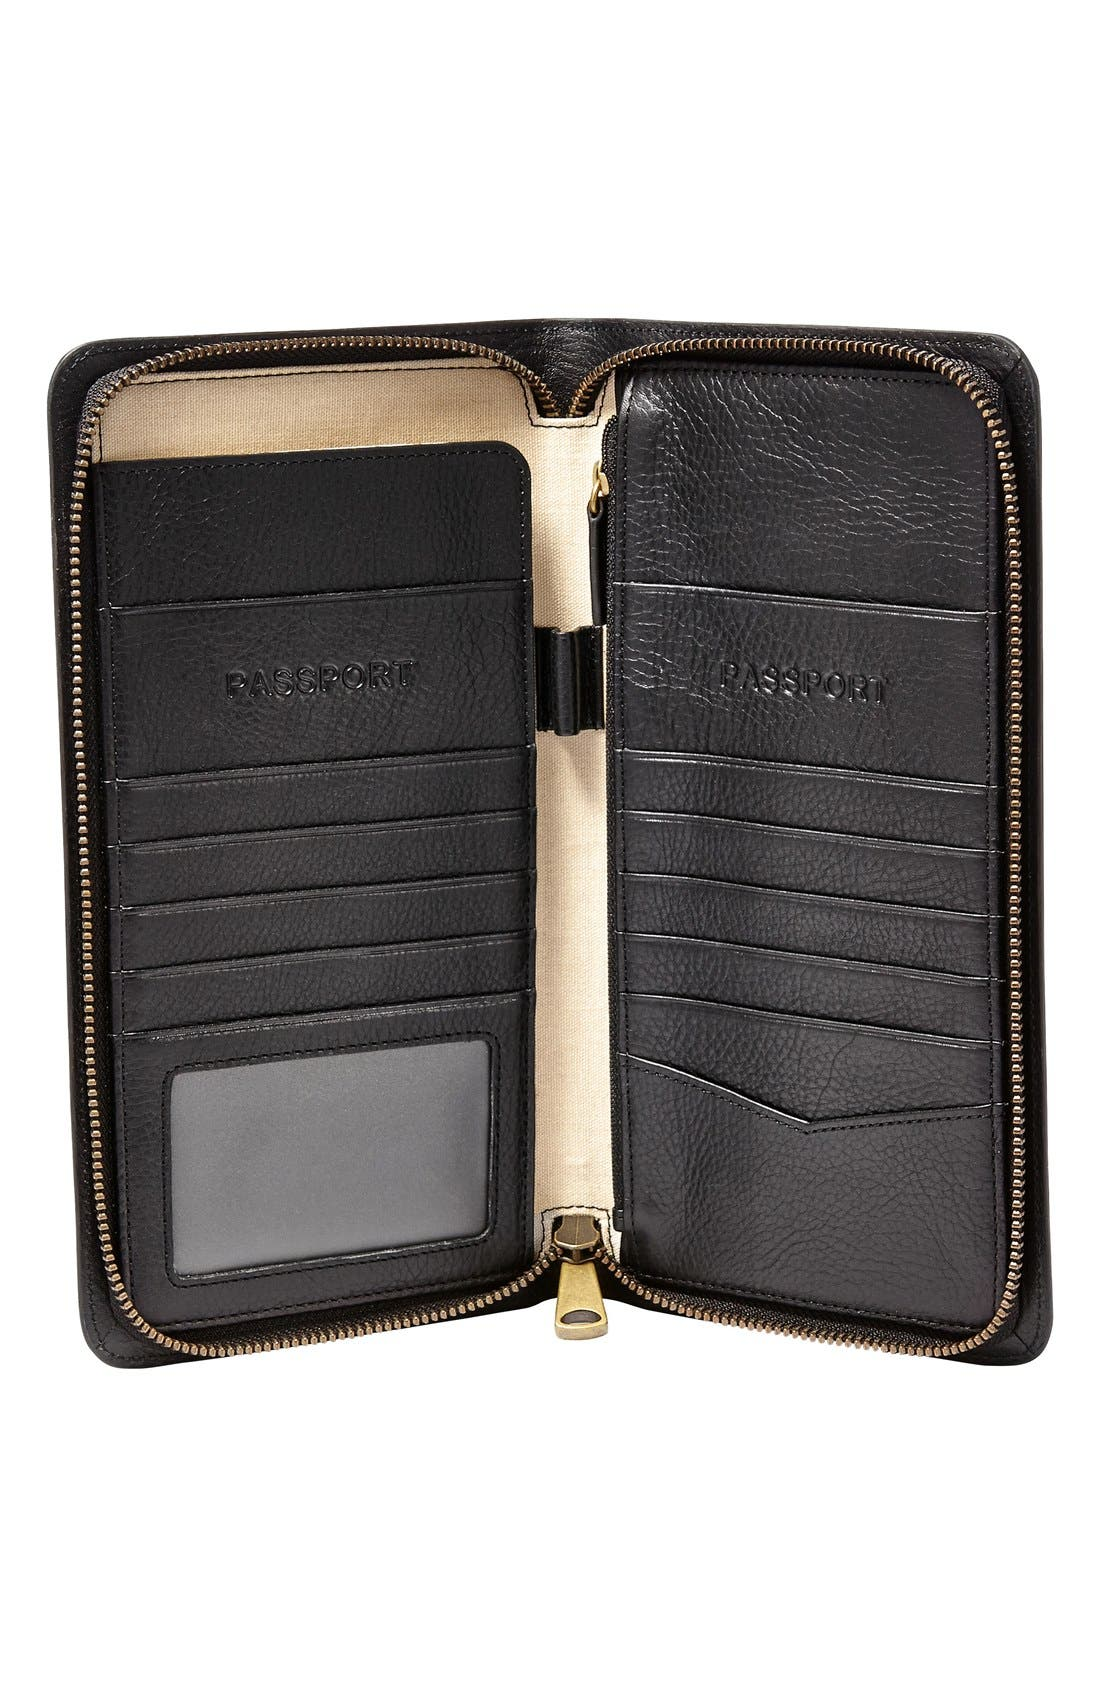 FOSSIL, Leather Zip Passport Case, Alternate thumbnail 2, color, BLACK